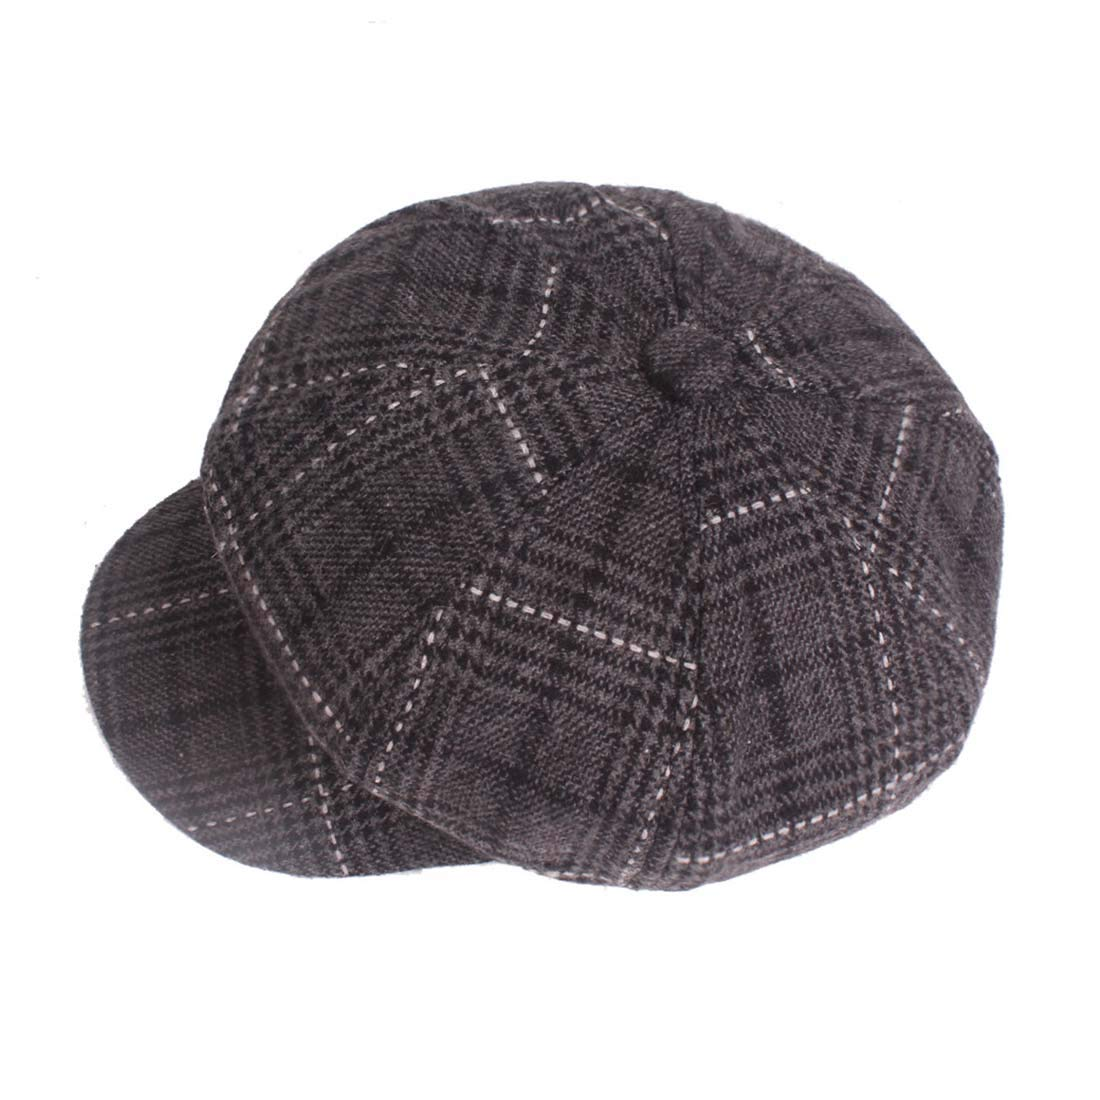 Topcoco Unisex 8 Panel Warm Tweed Newsboy Flat Cap Beret Ivy Painting Hat